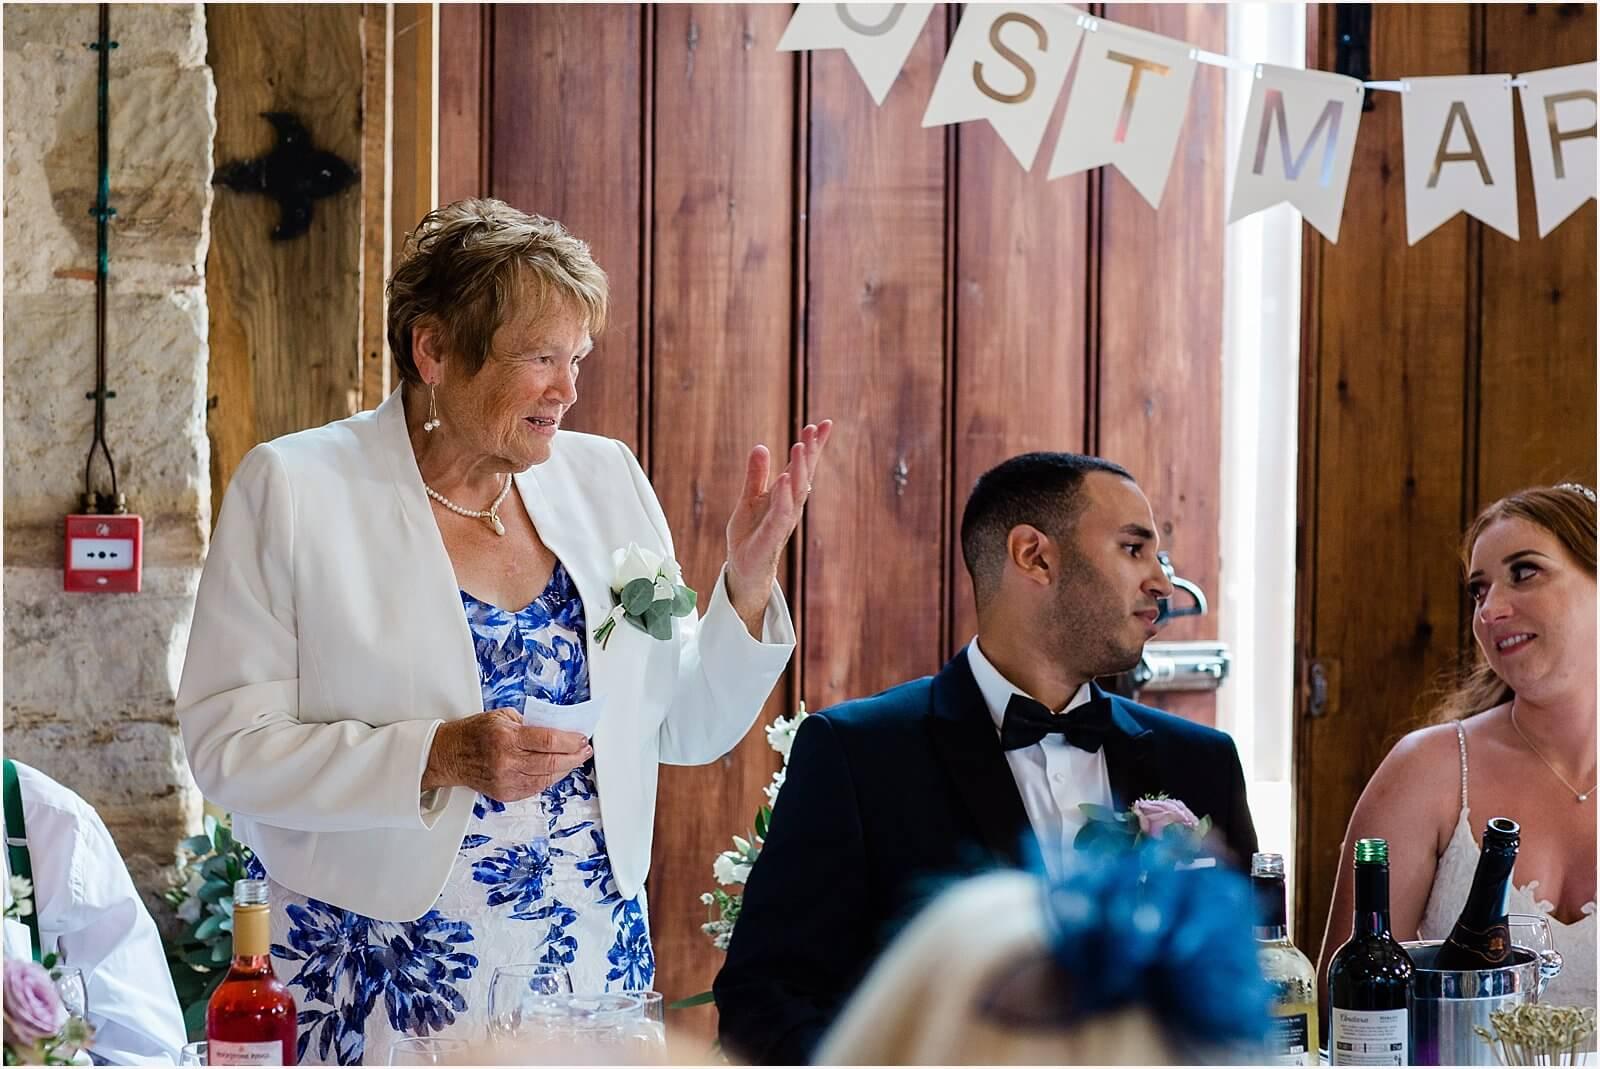 Swallows Oast Wedding - Jakki + Luke's barn wedding photography 47